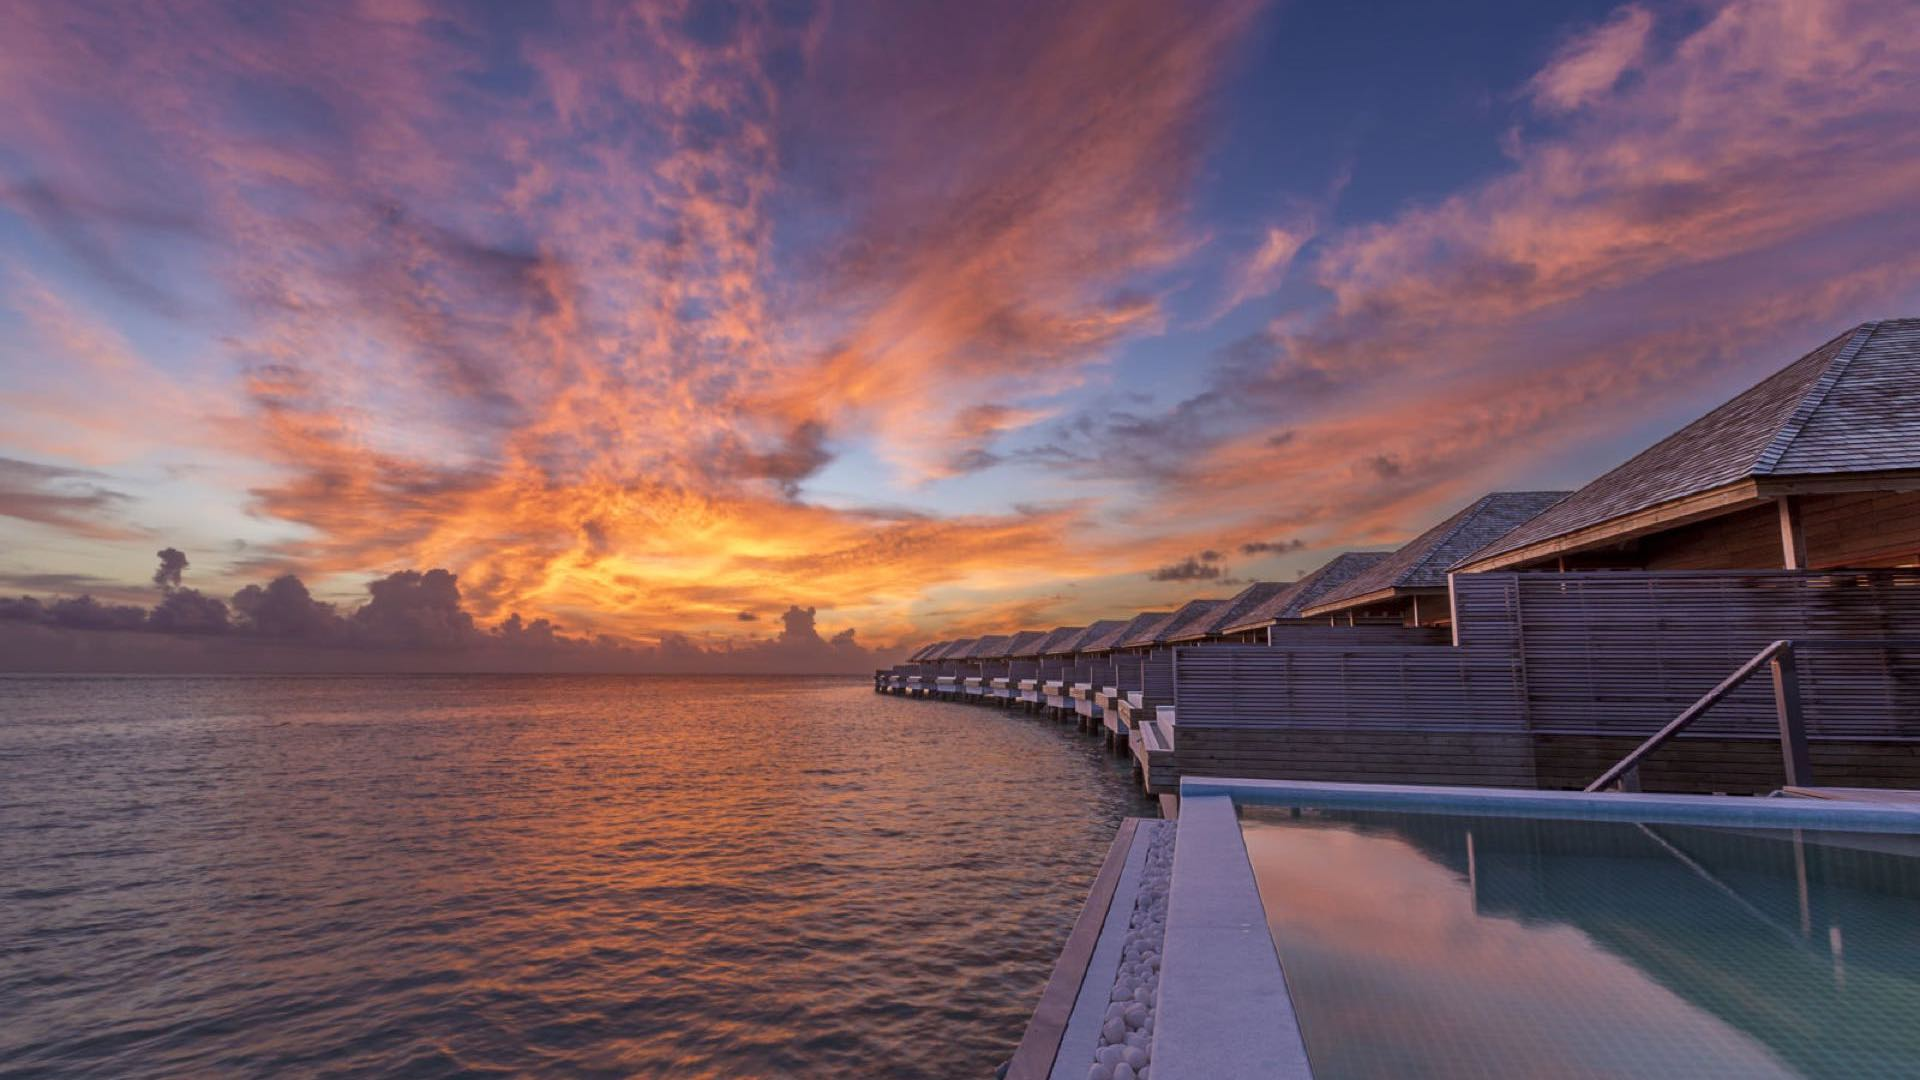 Hurawalhi Island Resort 5* - Foto delle palafitte al tramonto